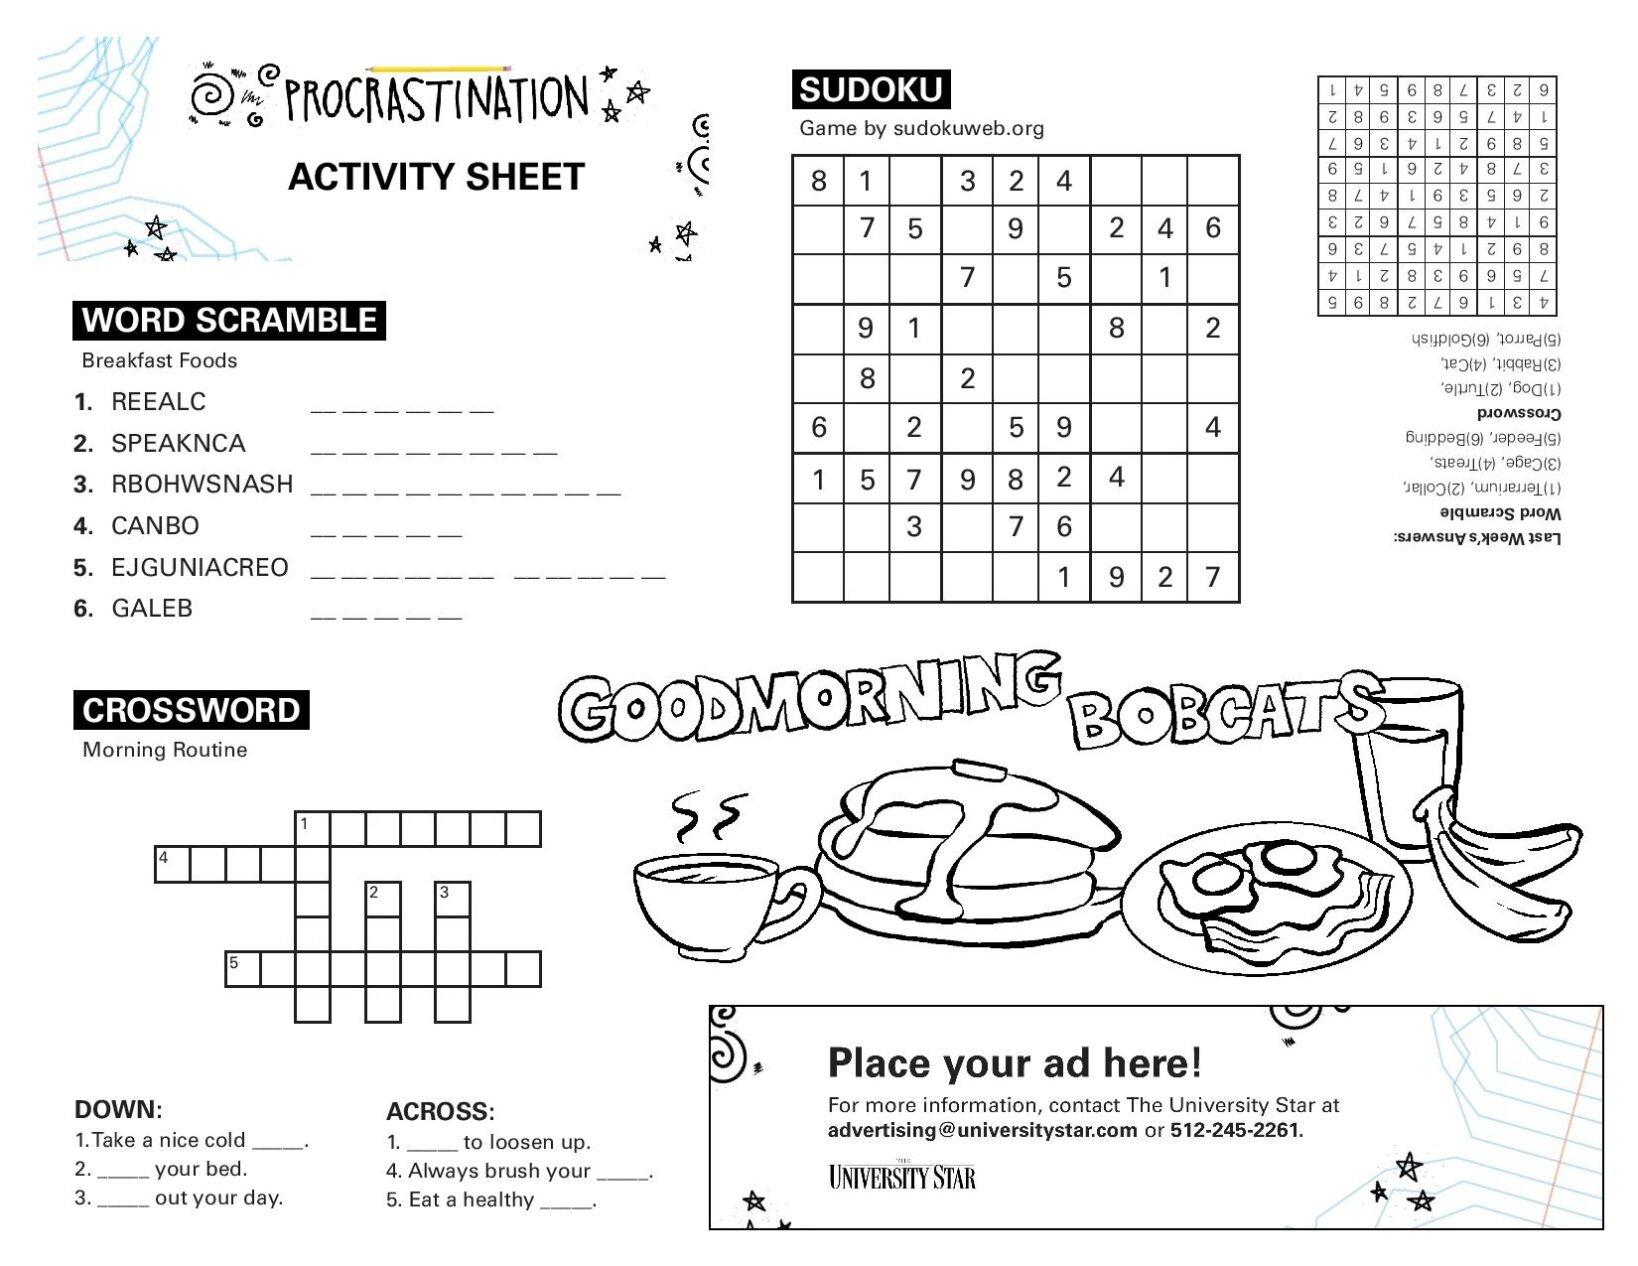 09/22 printable activity sheet.